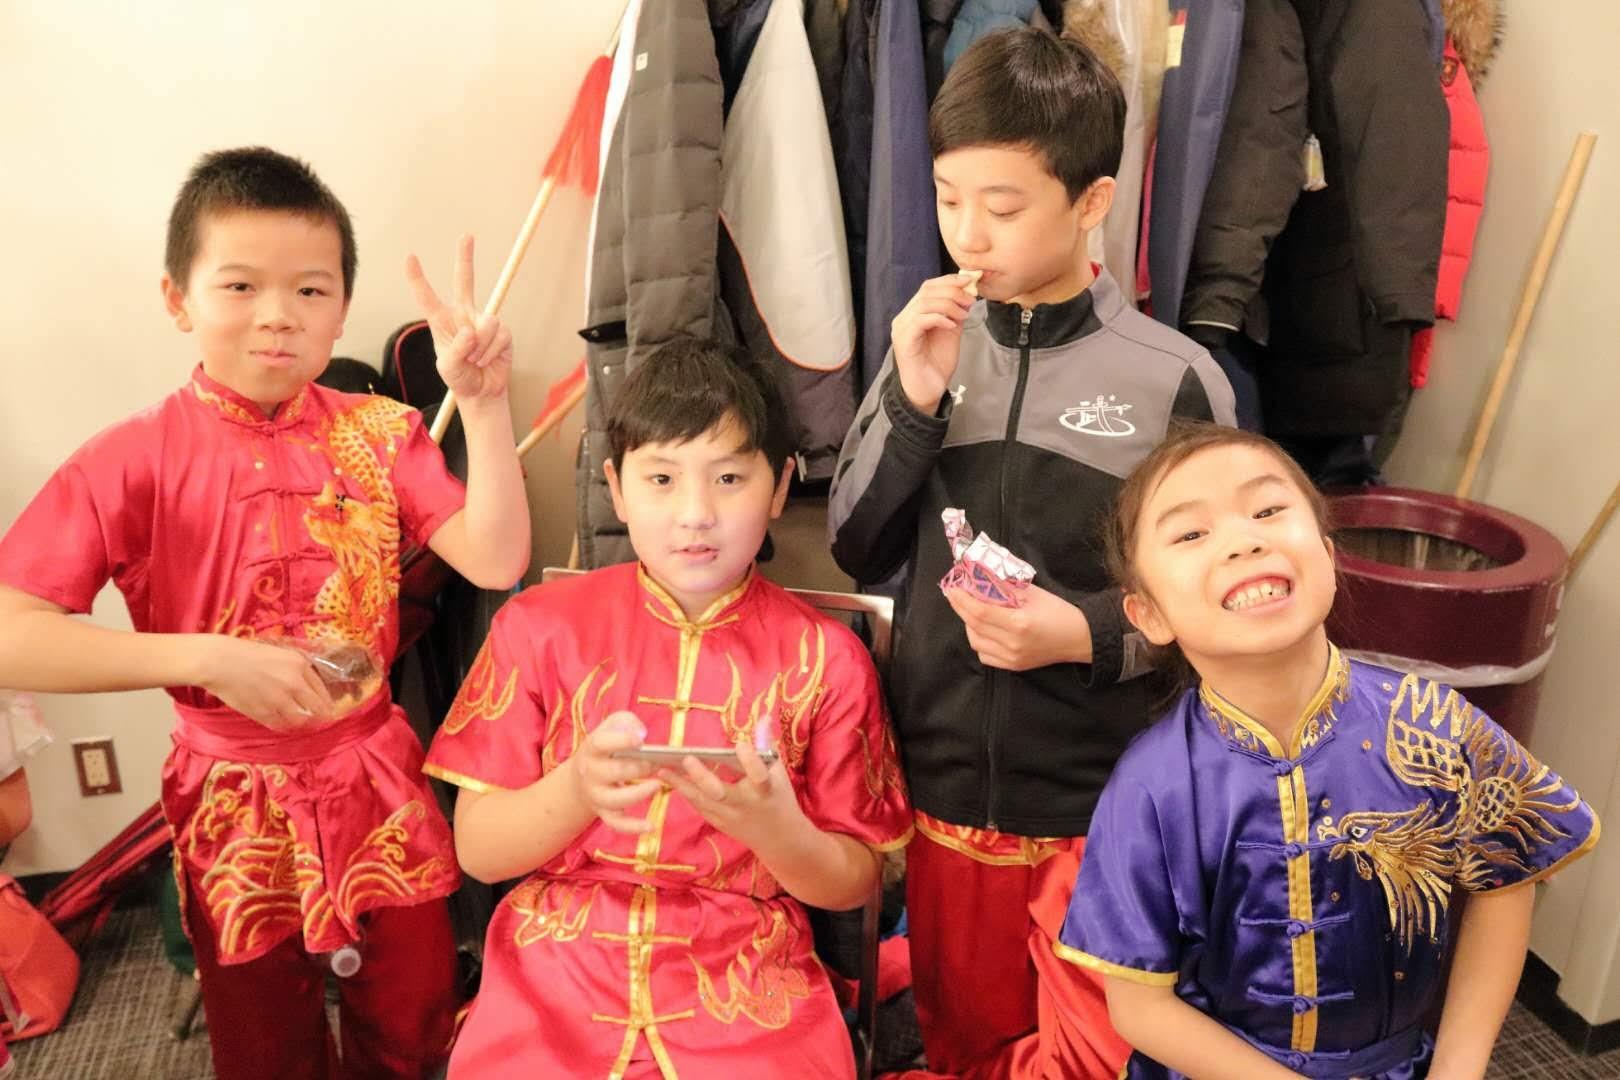 wayland-li-wushu-children-spring-fesitval-toronto-canada-2019-23.jpg